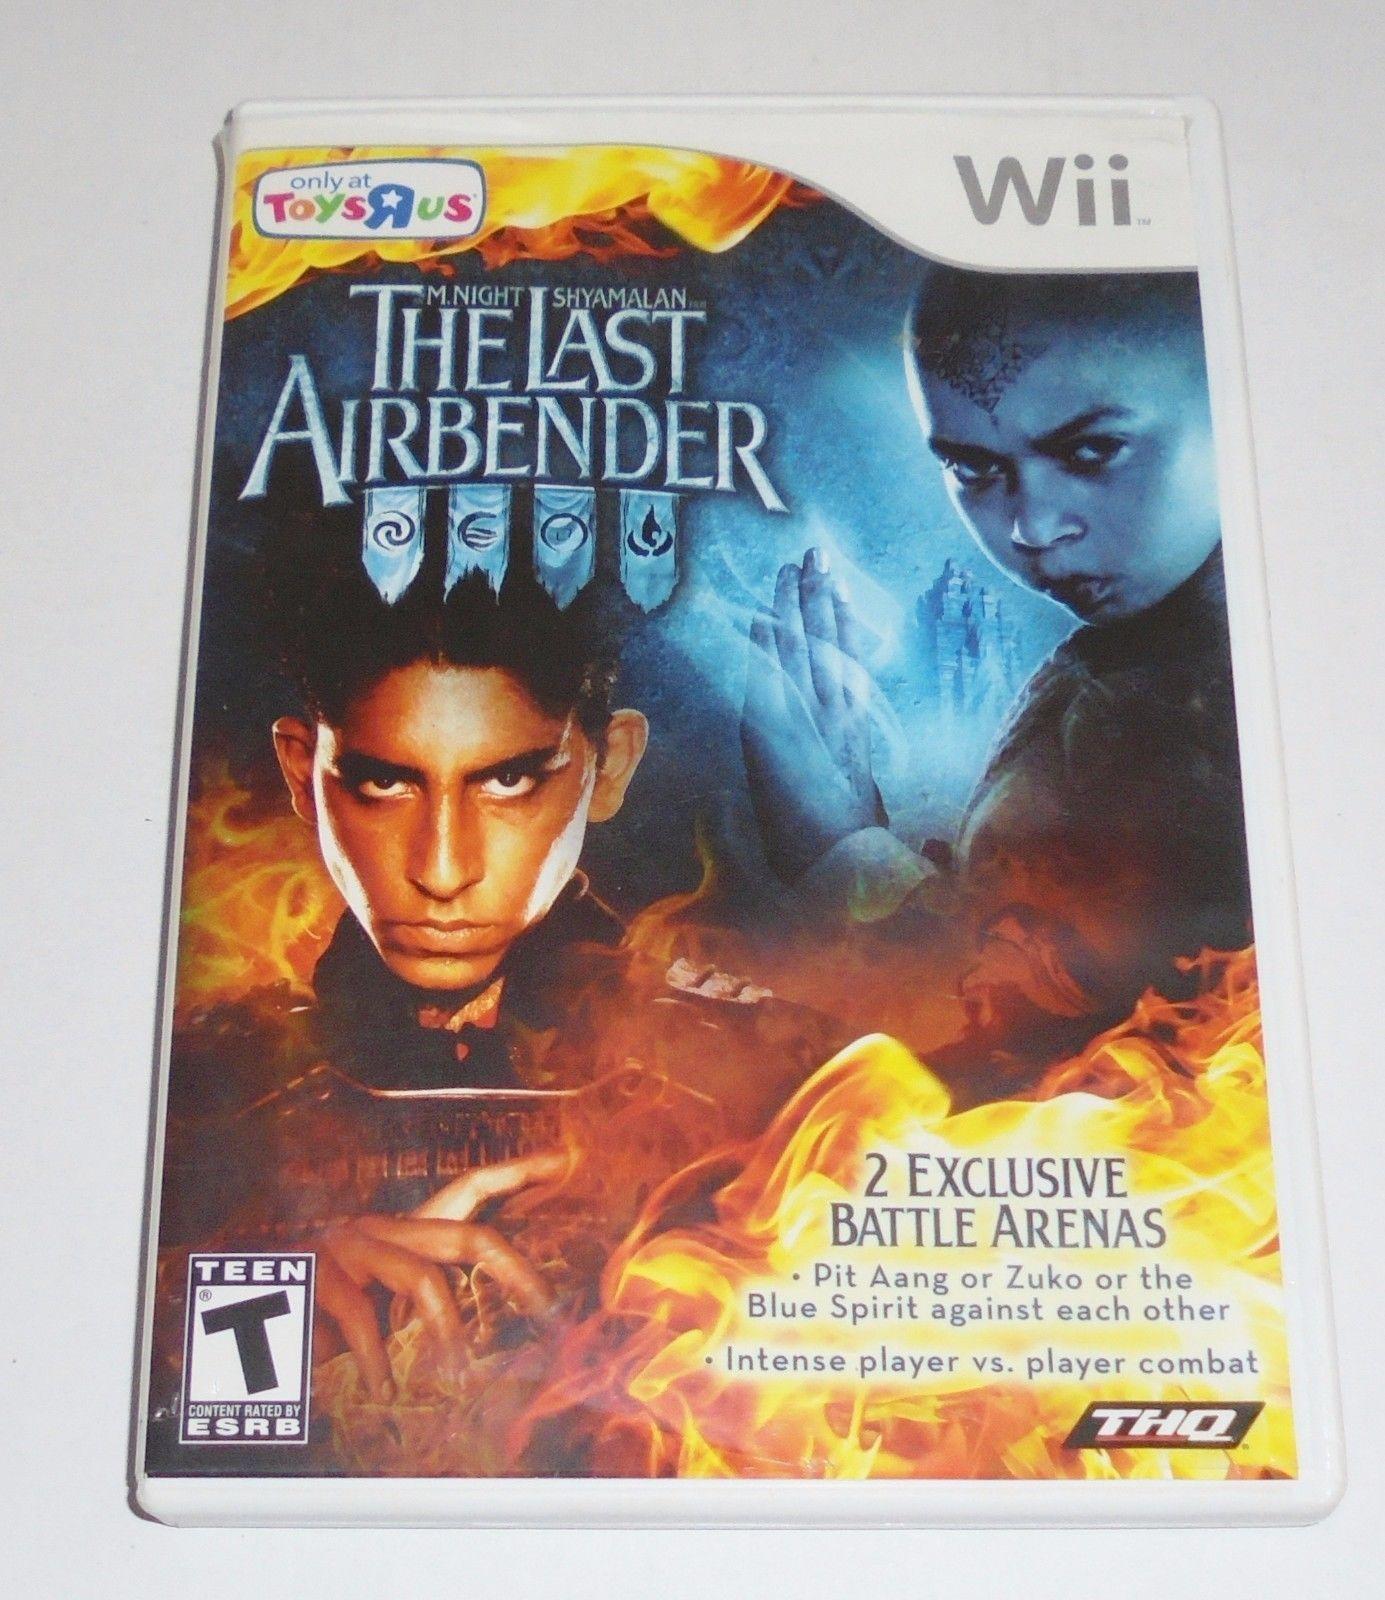 M Night Shyamalan The Last Airbender Nintendo Wii Video Game Air Bender